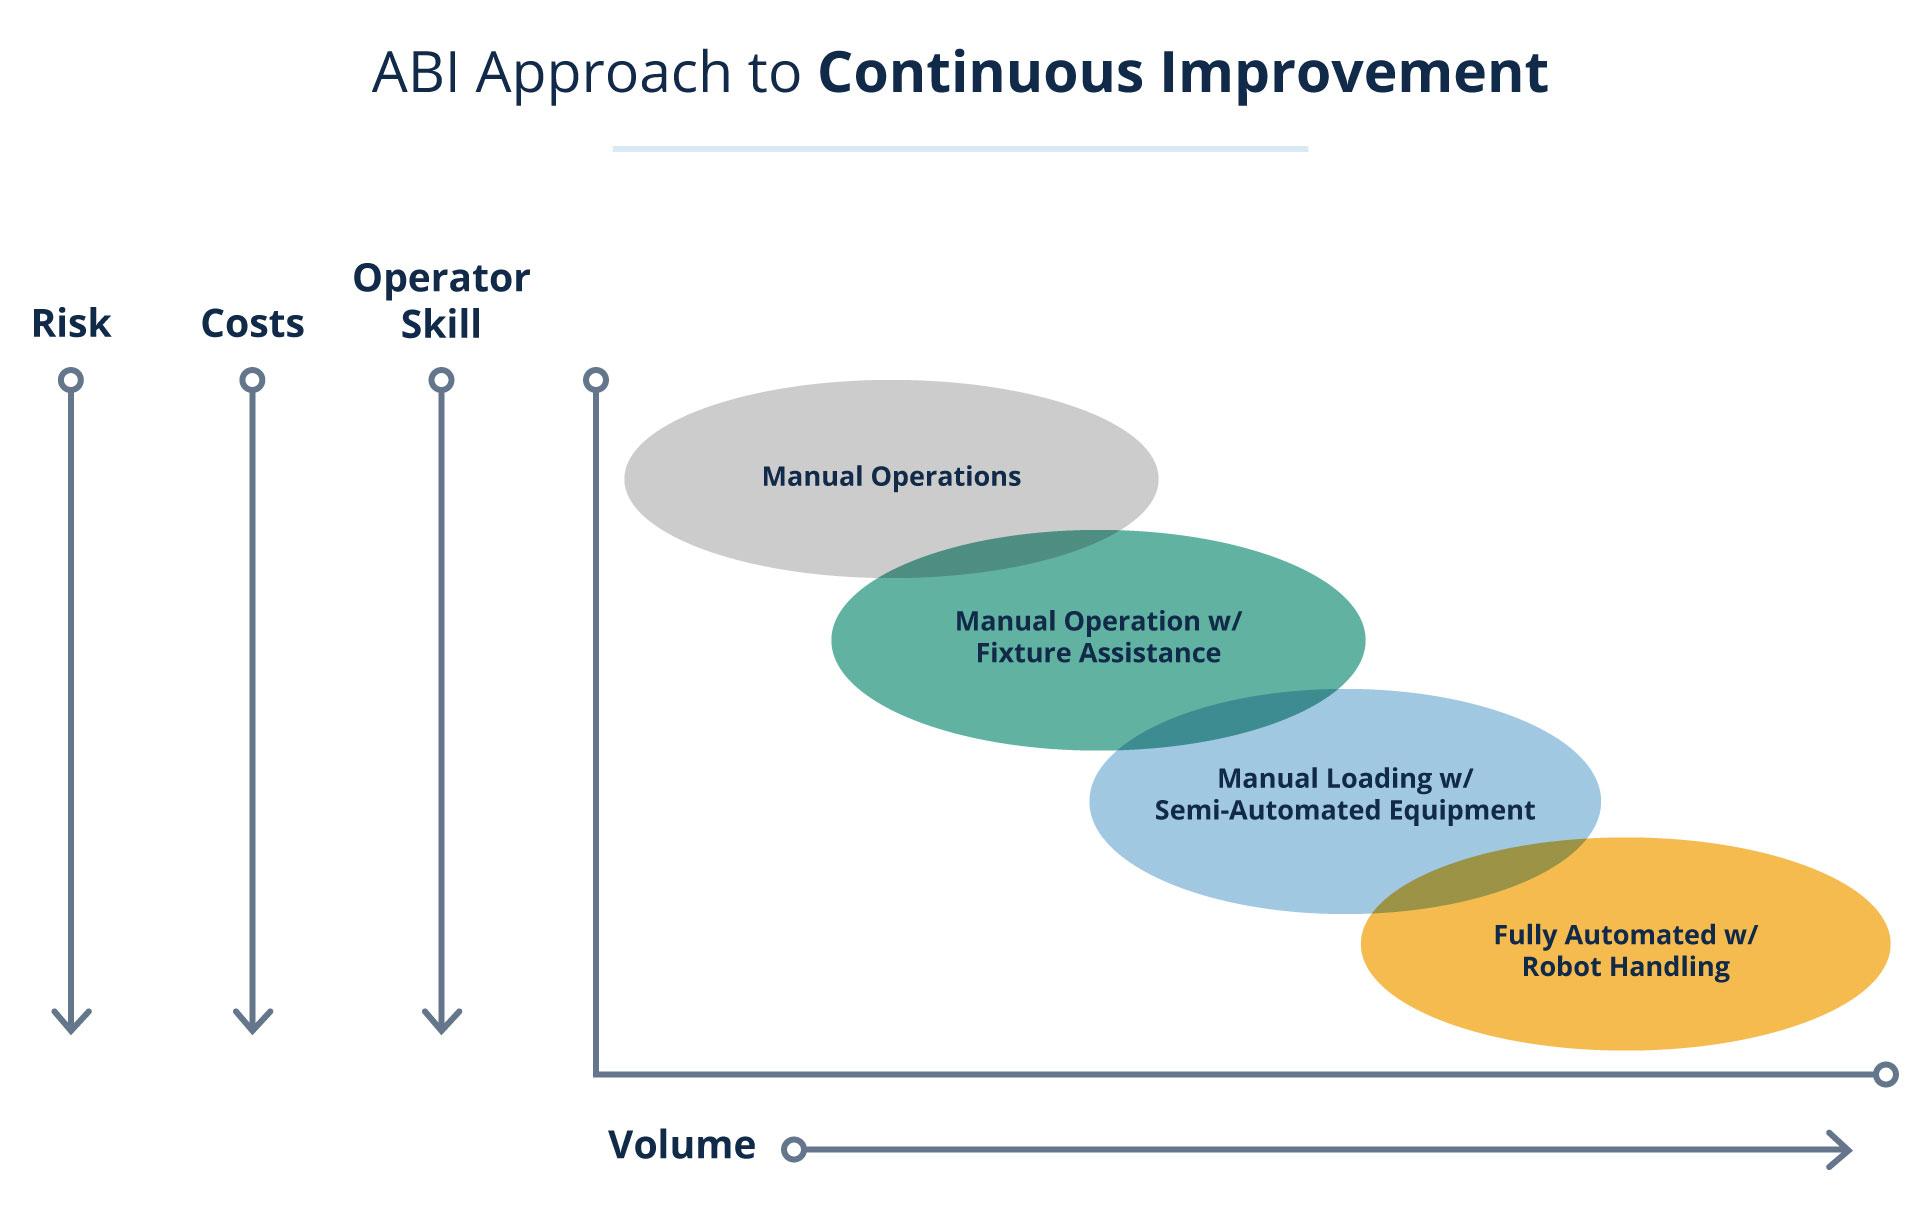 ABI Continuous Improvement Chart